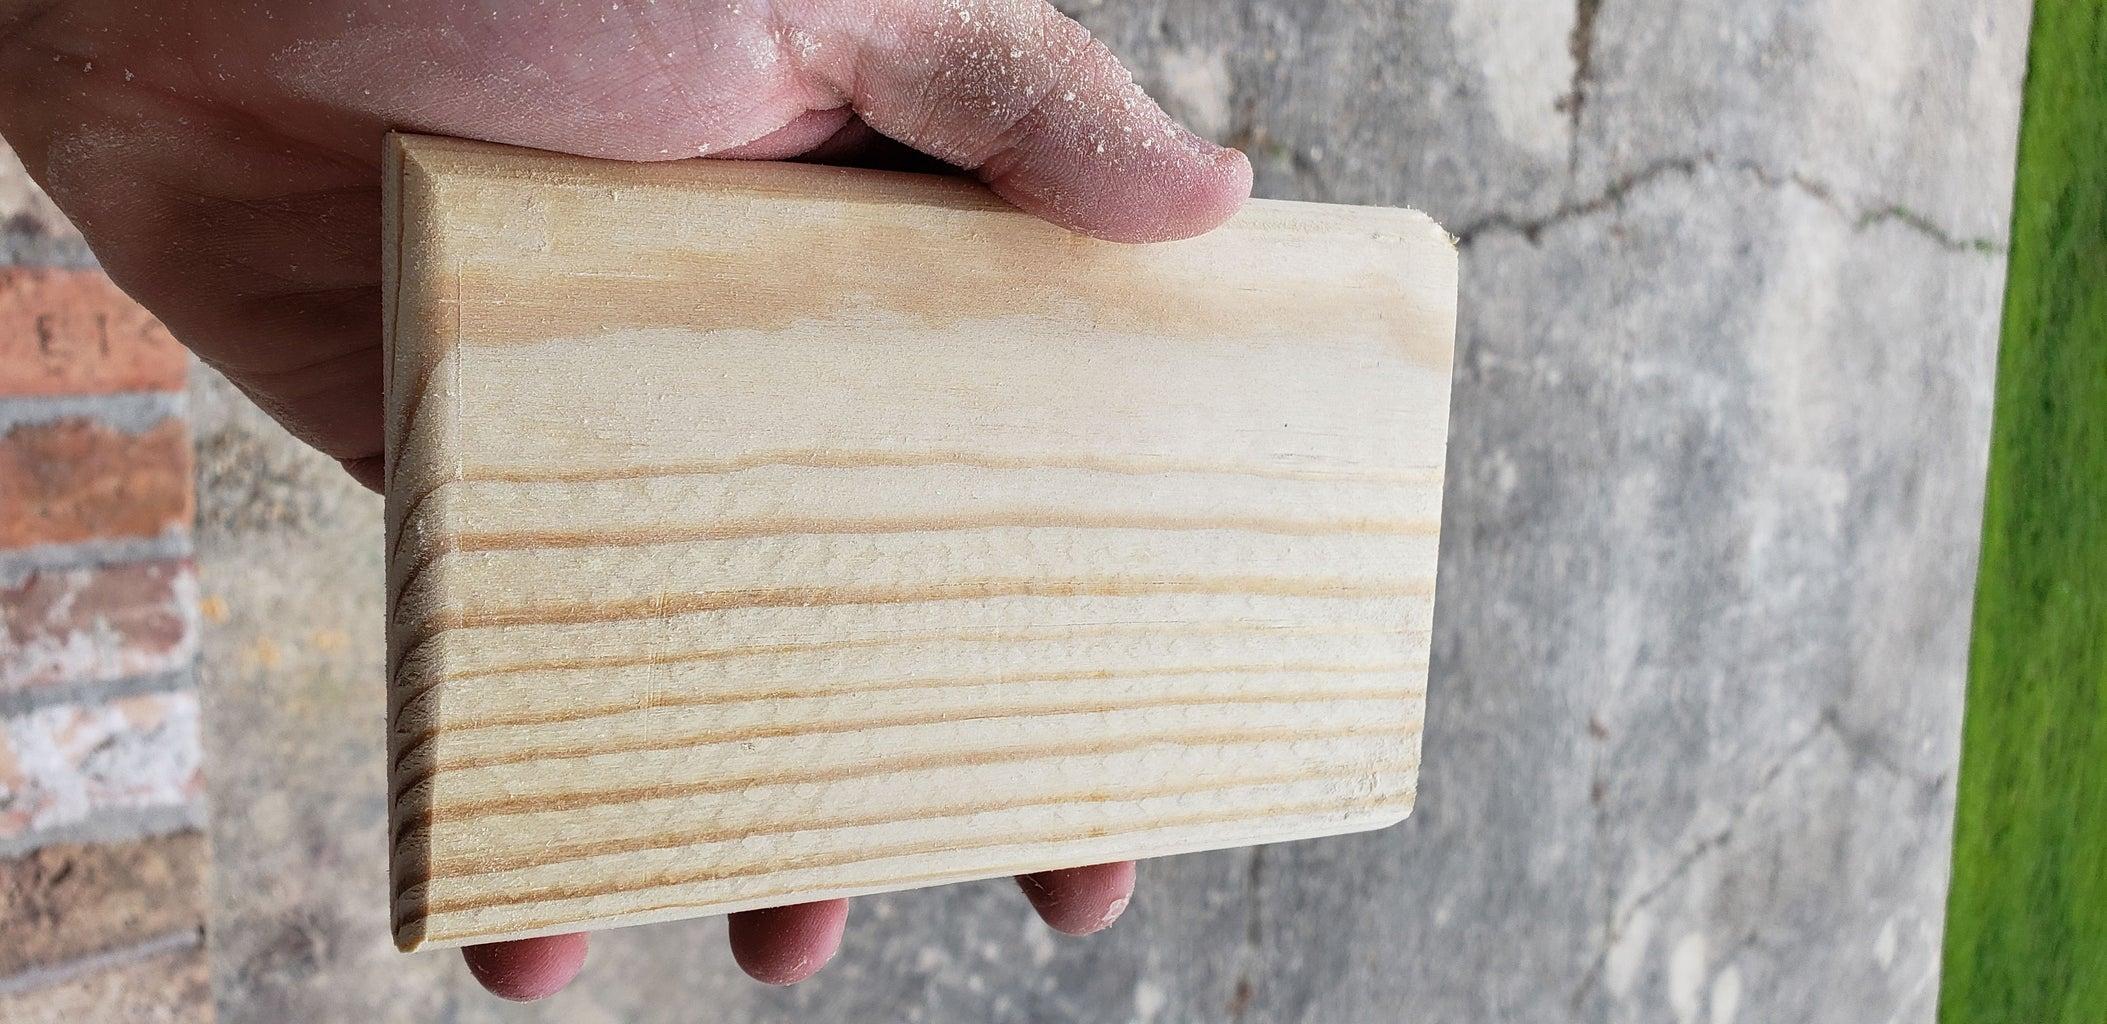 Finish Building the Bricks